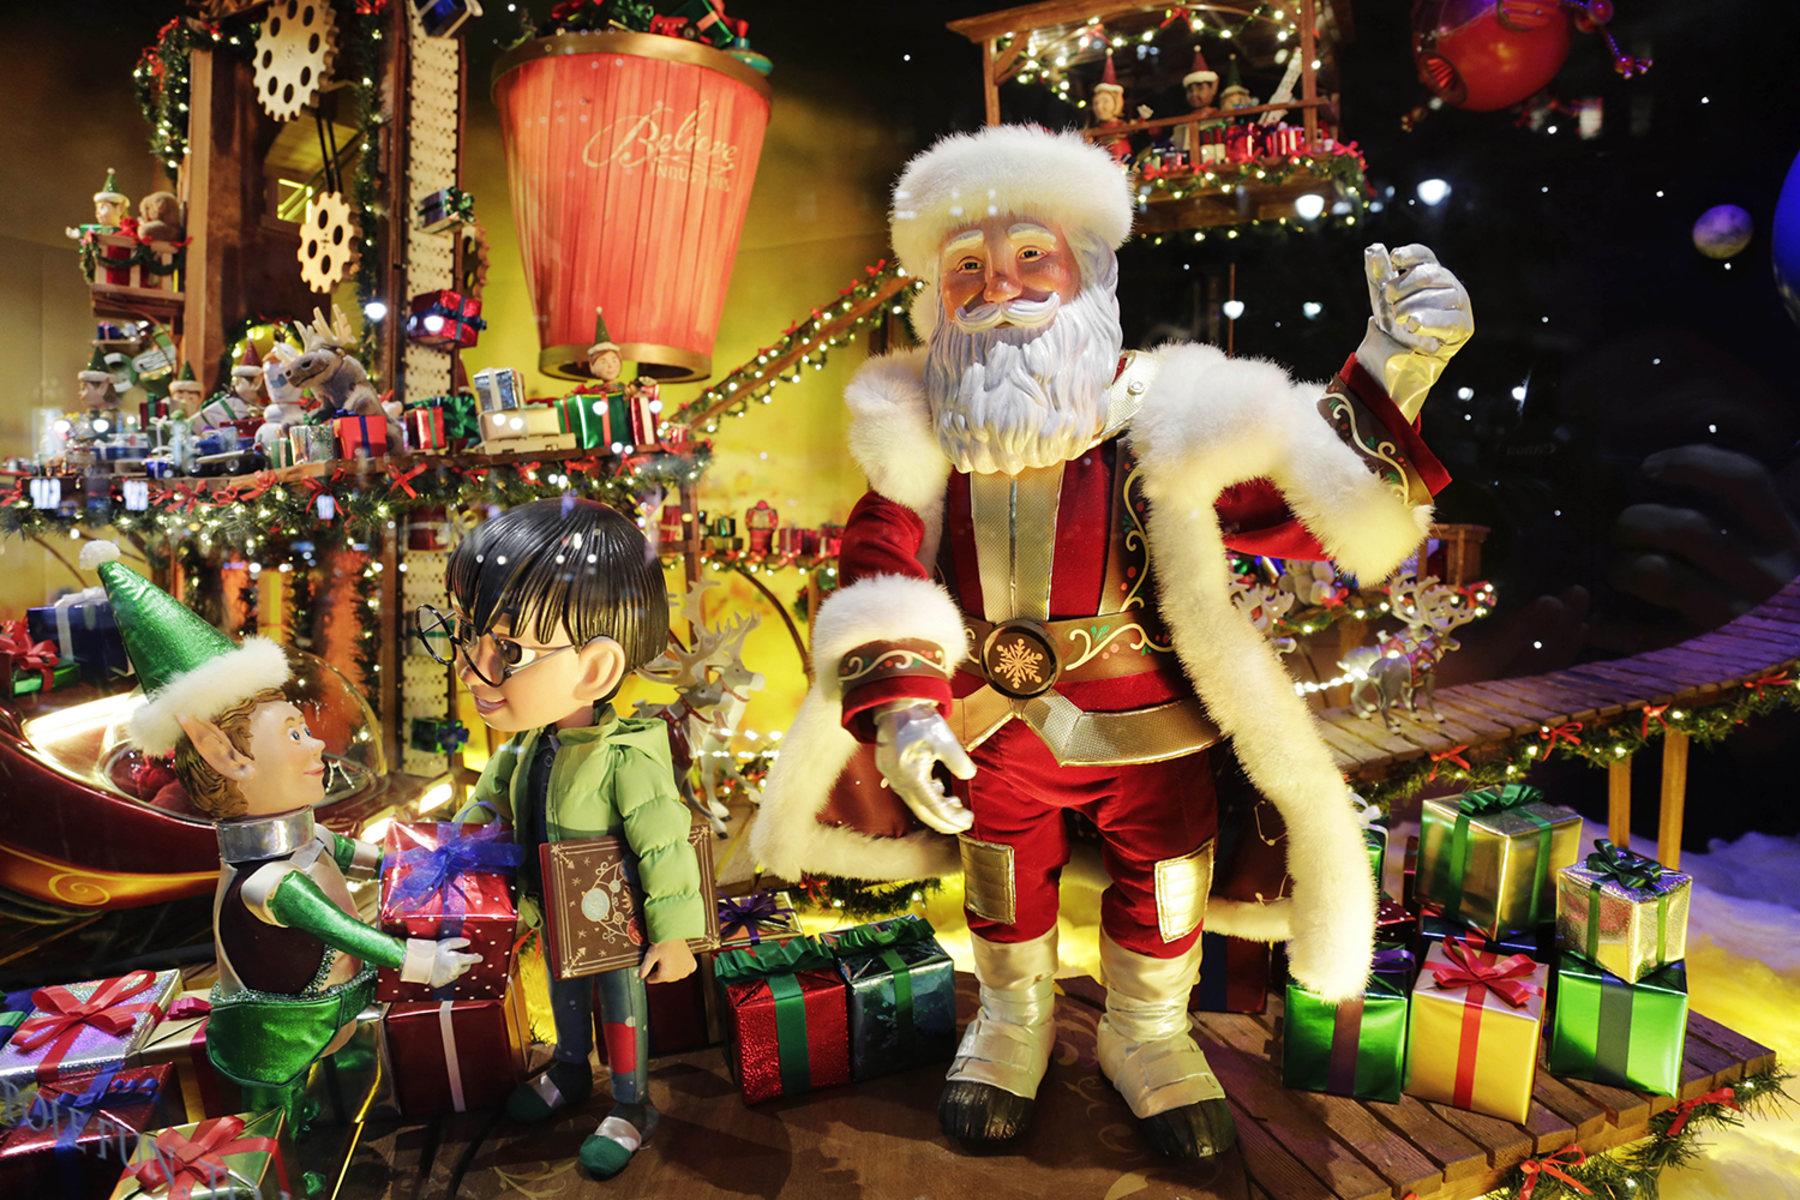 Imagini pentru santa claus in new york city